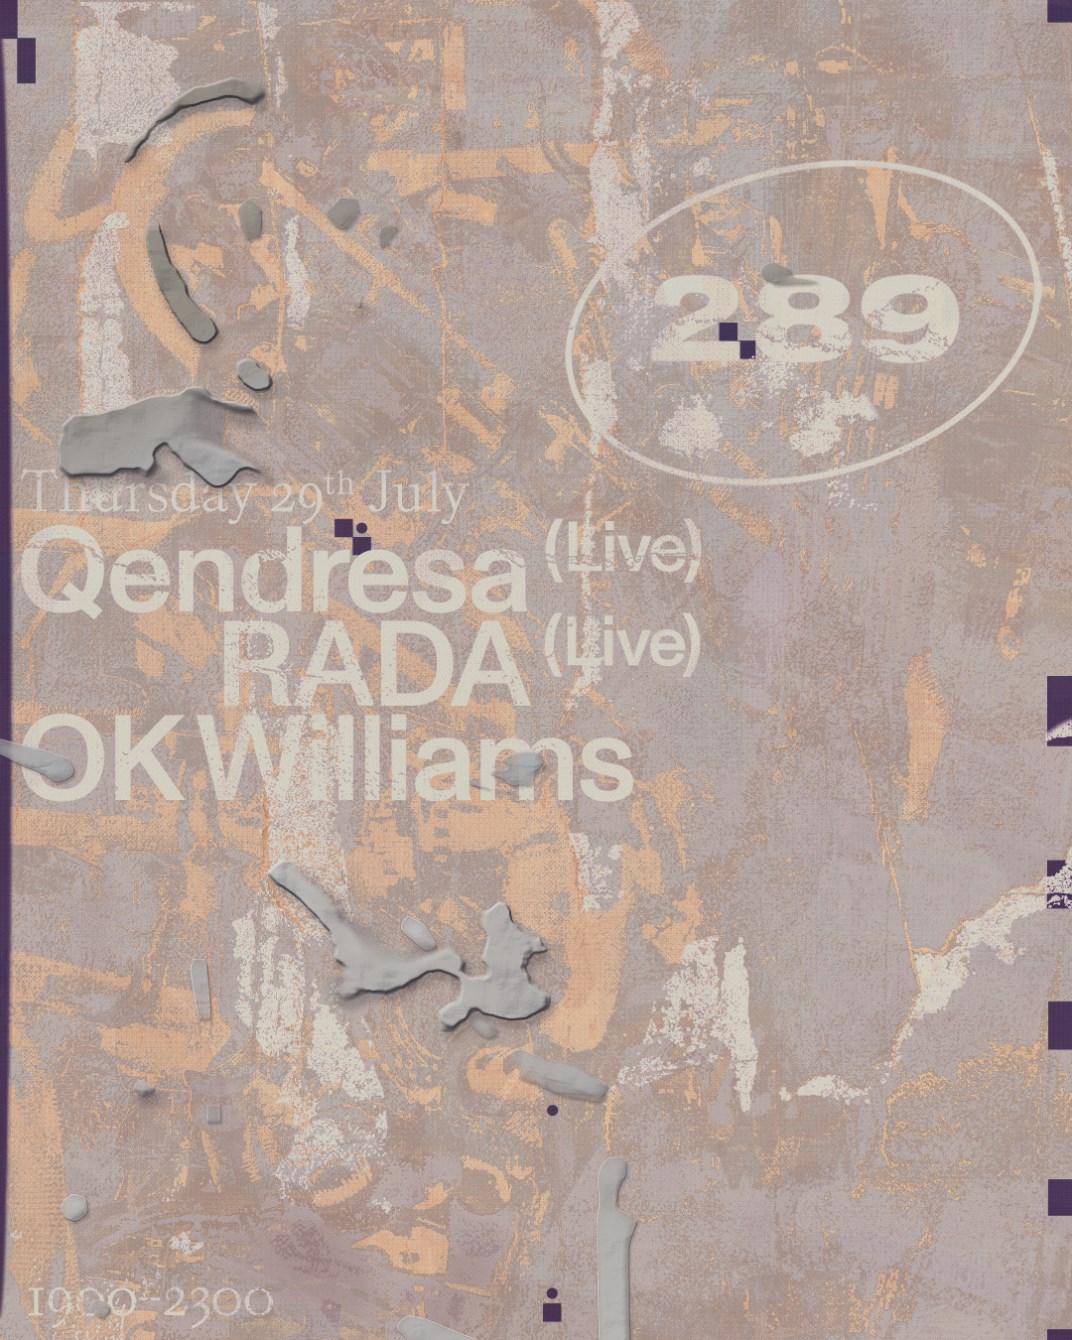 Space289 presents: Qendresa (Live), Rada & OK Williams - Flyer front